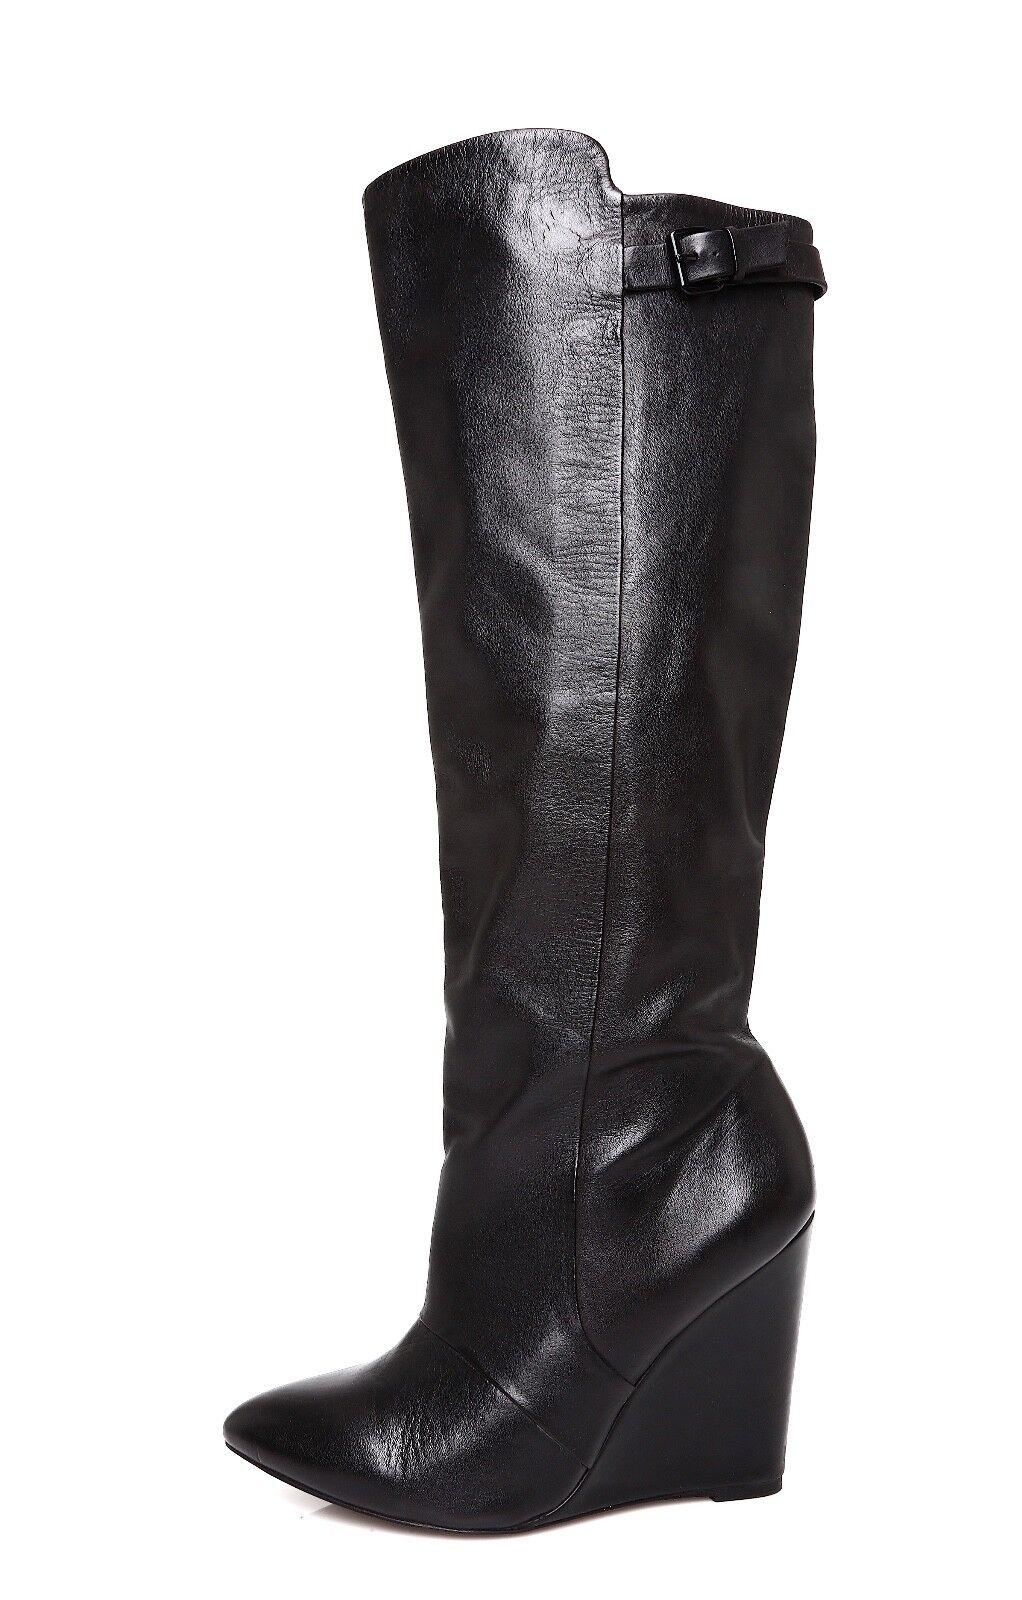 Steve Madden Zylon de tan Cuero Para Mujeres Mujeres Mujeres Bota Negro talla 9.5 M 4478   punto de venta